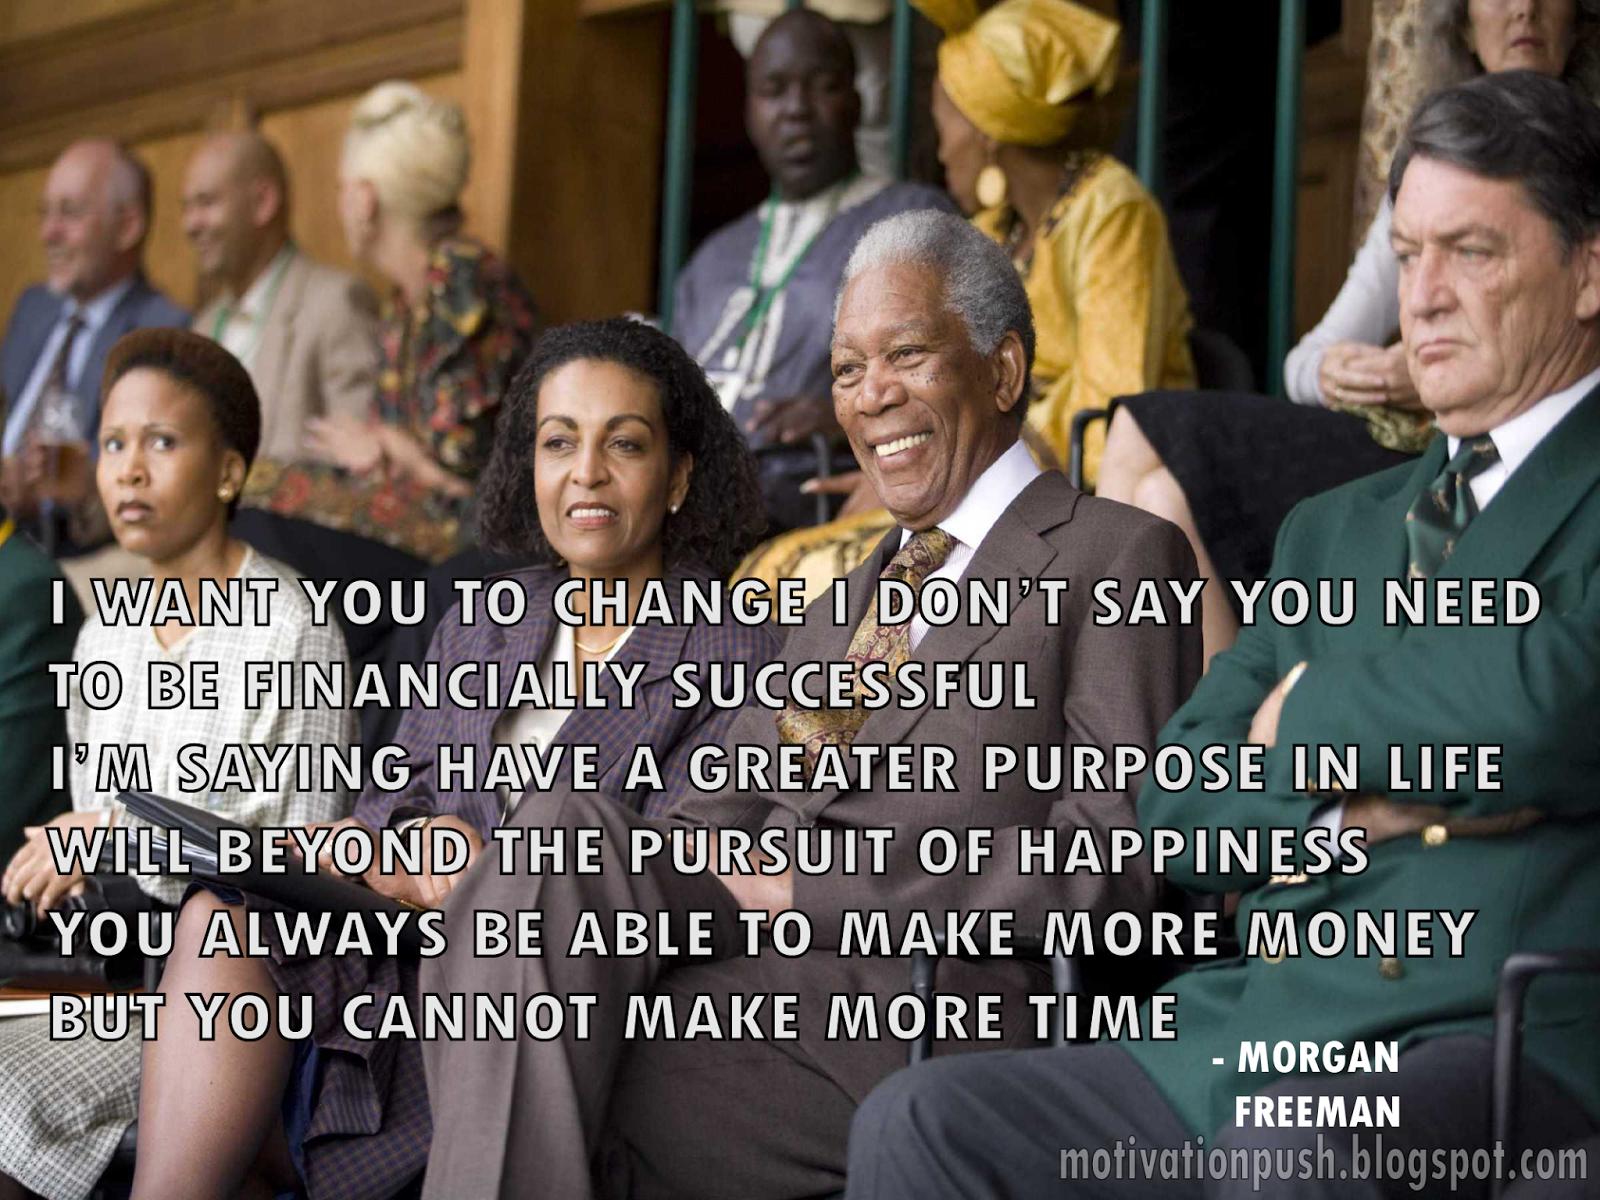 Motivate Me Morgan Freeman S Quotes